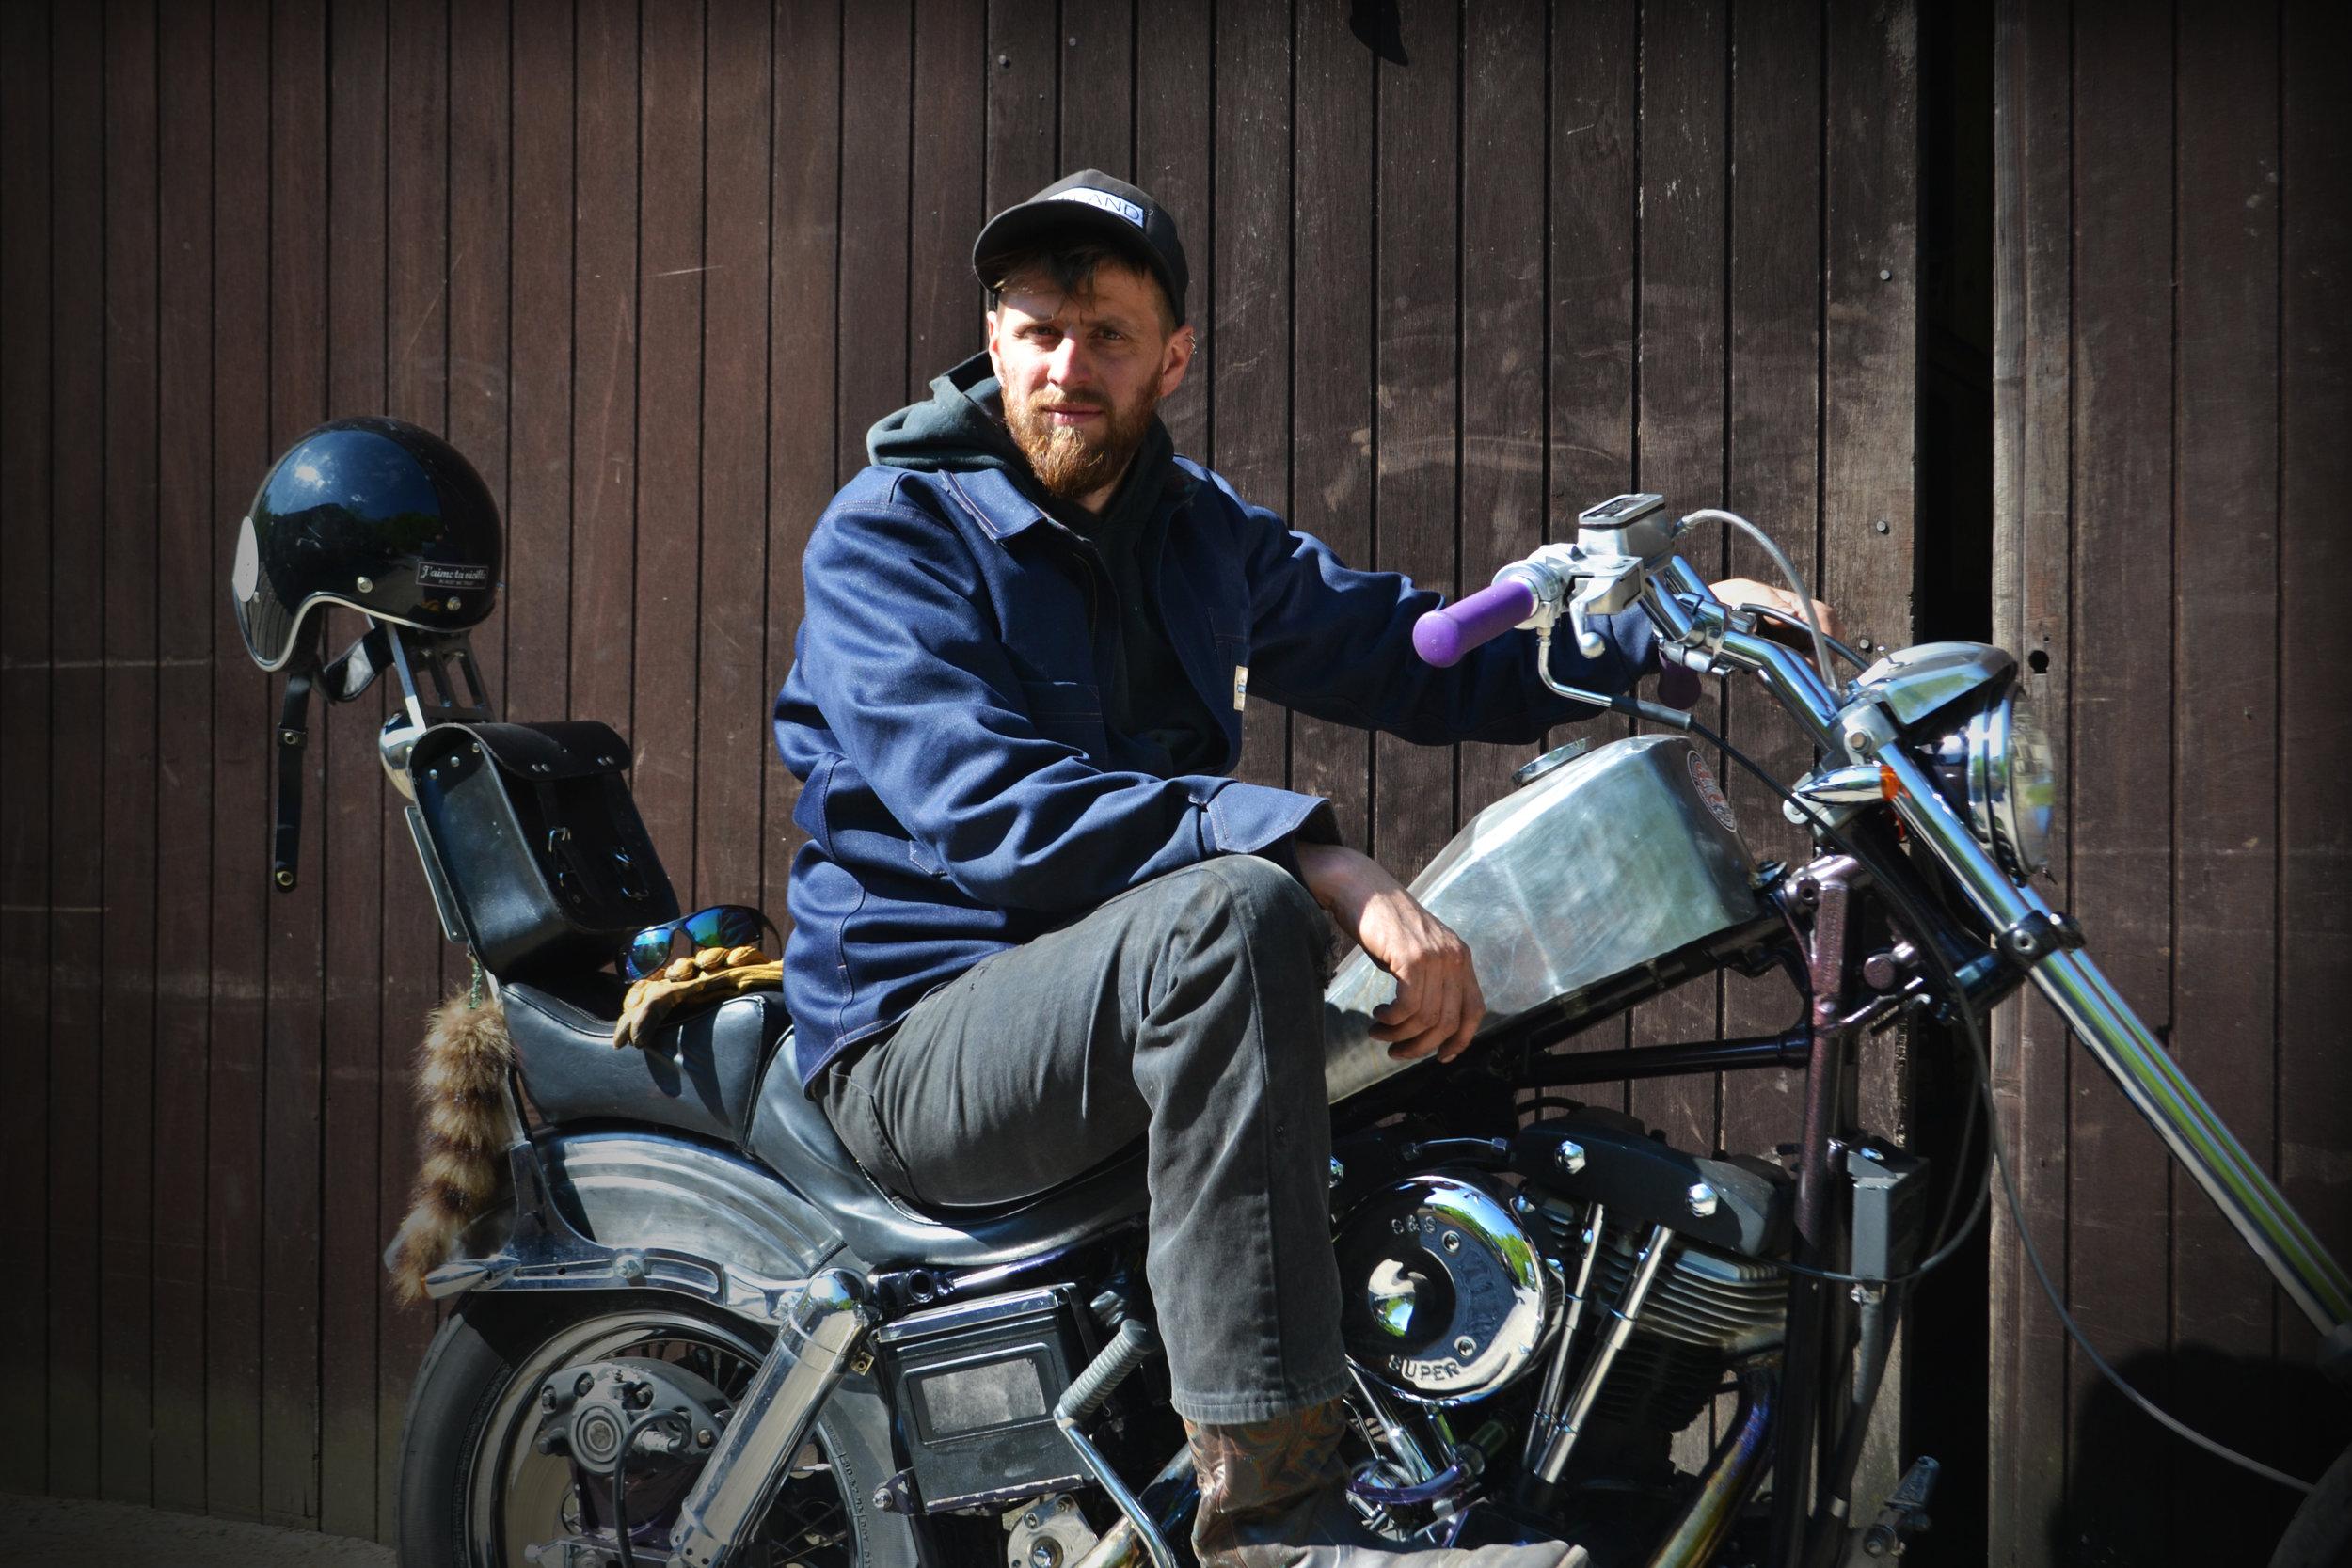 Greg's Ride | #TheMotoSocialNAMUR